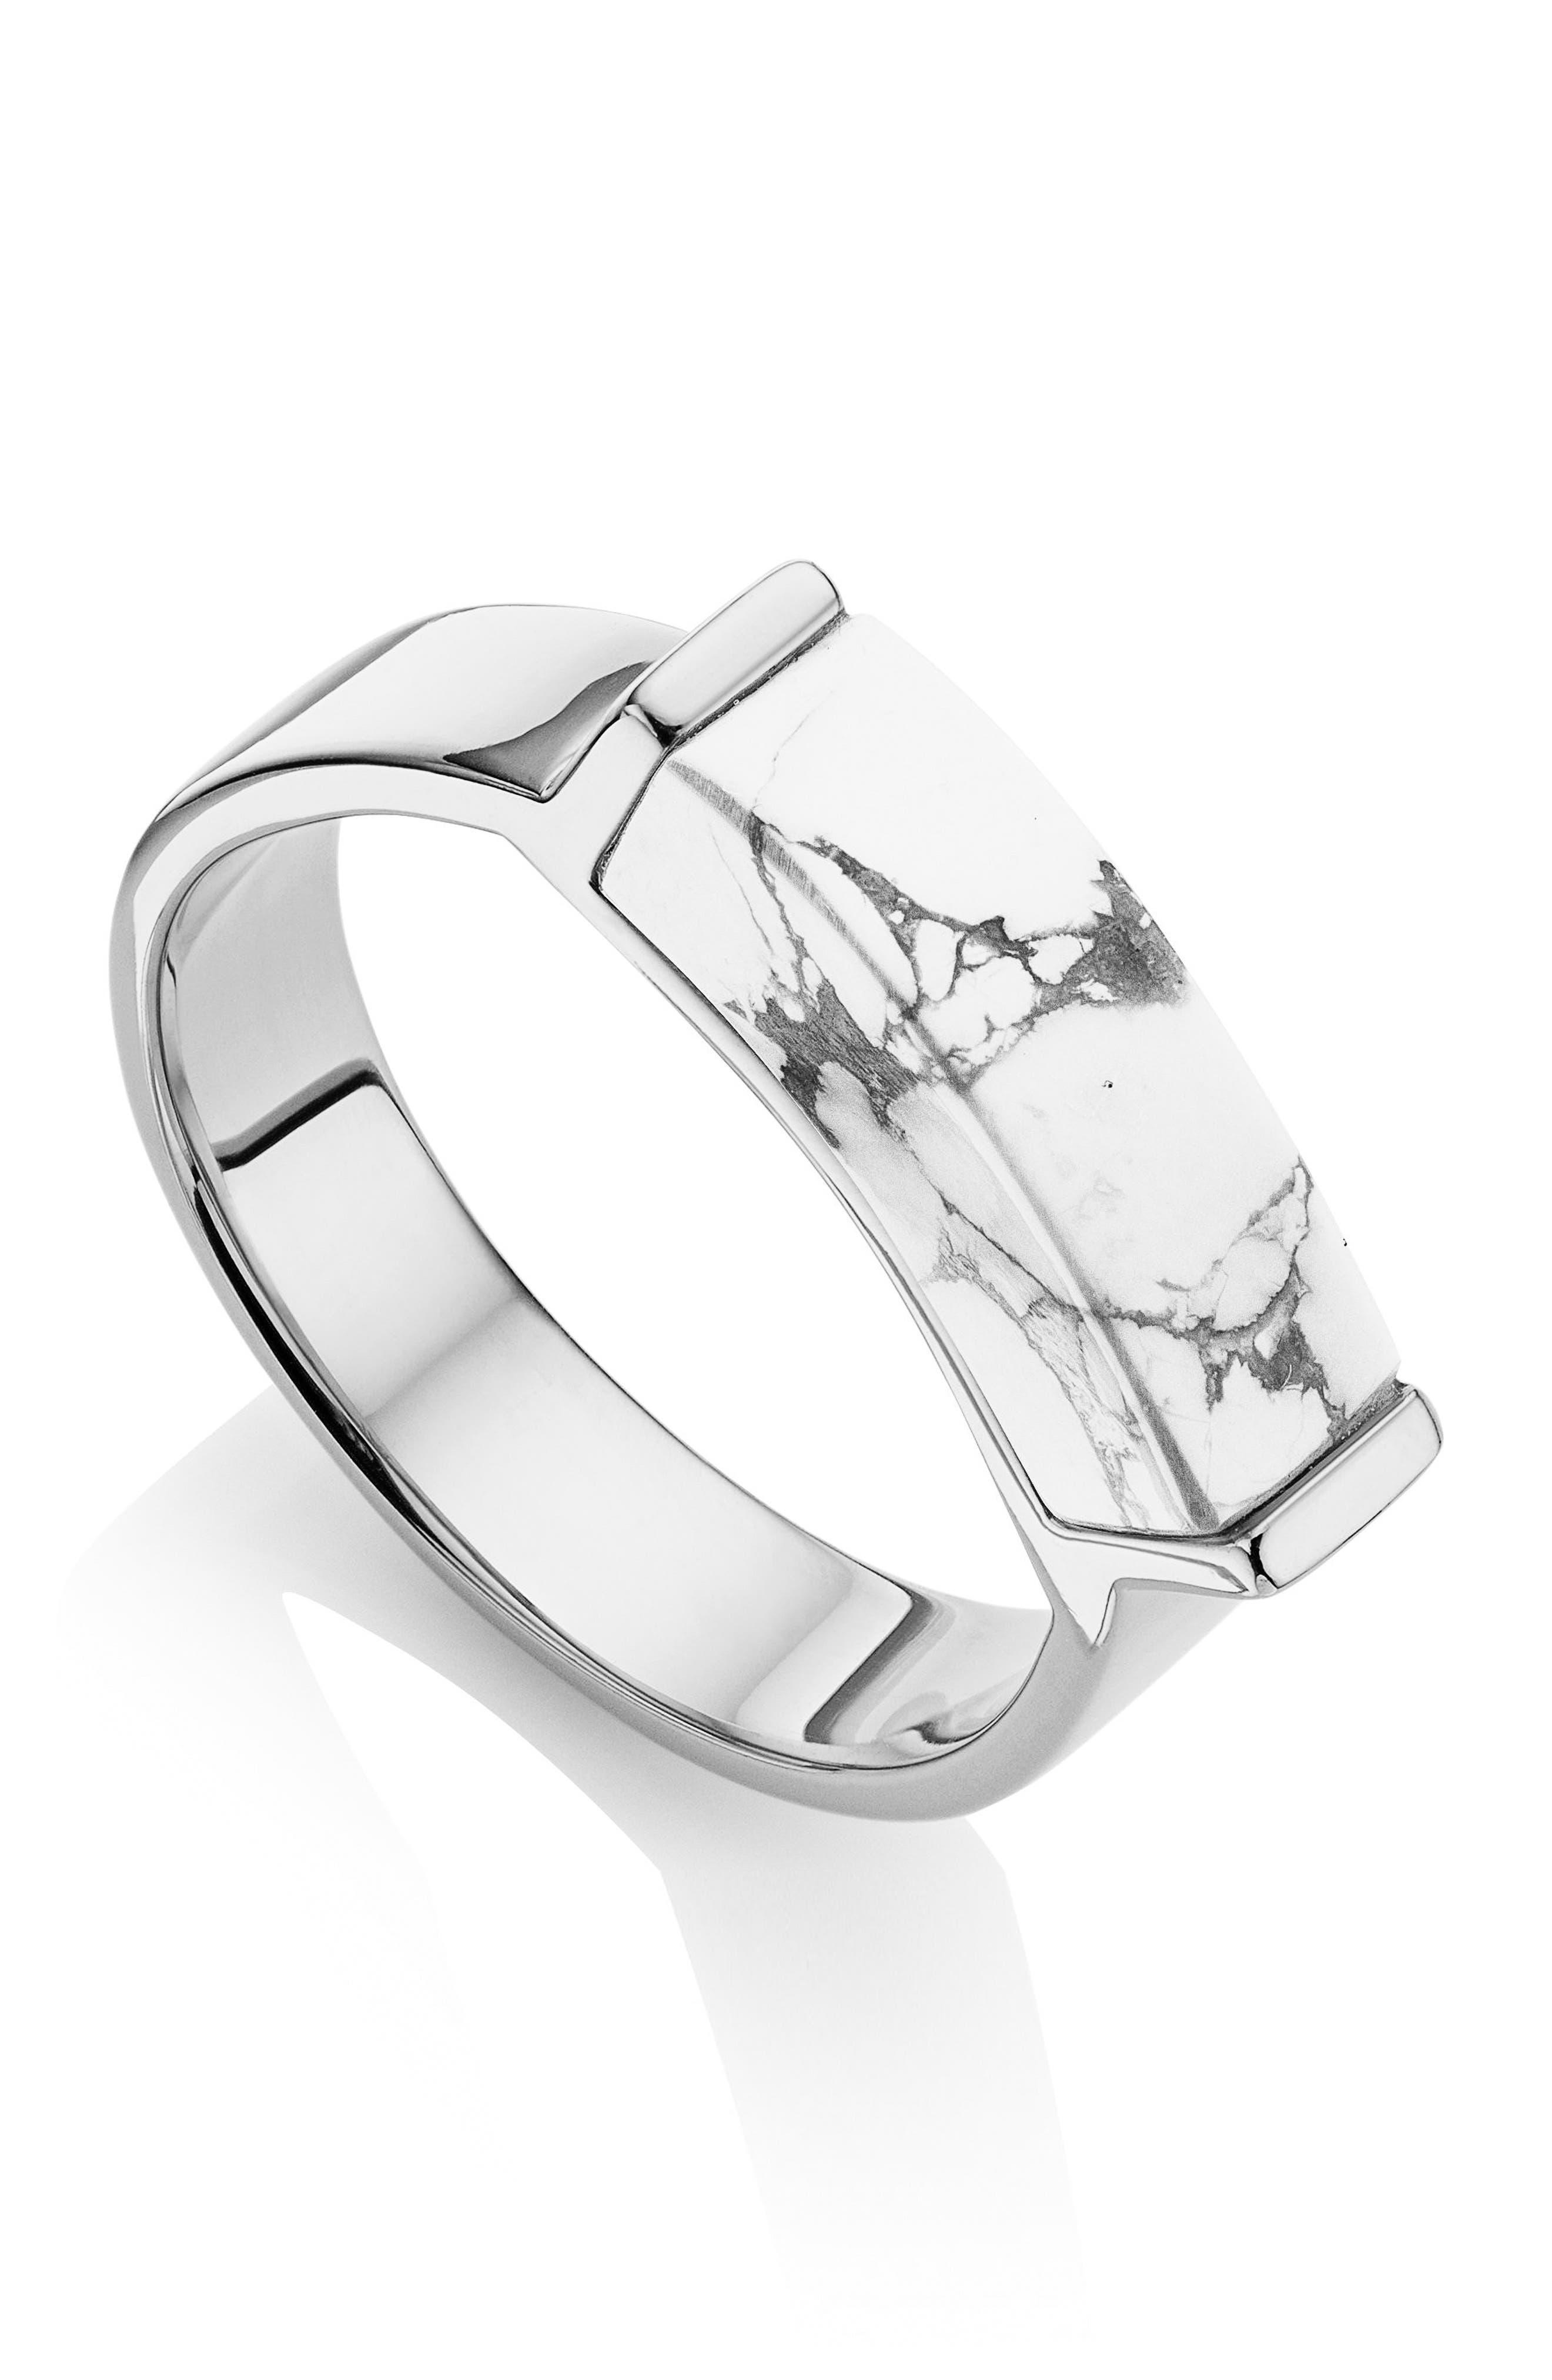 Baja Deco Ring,                             Main thumbnail 1, color,                             Silver/ Howlite